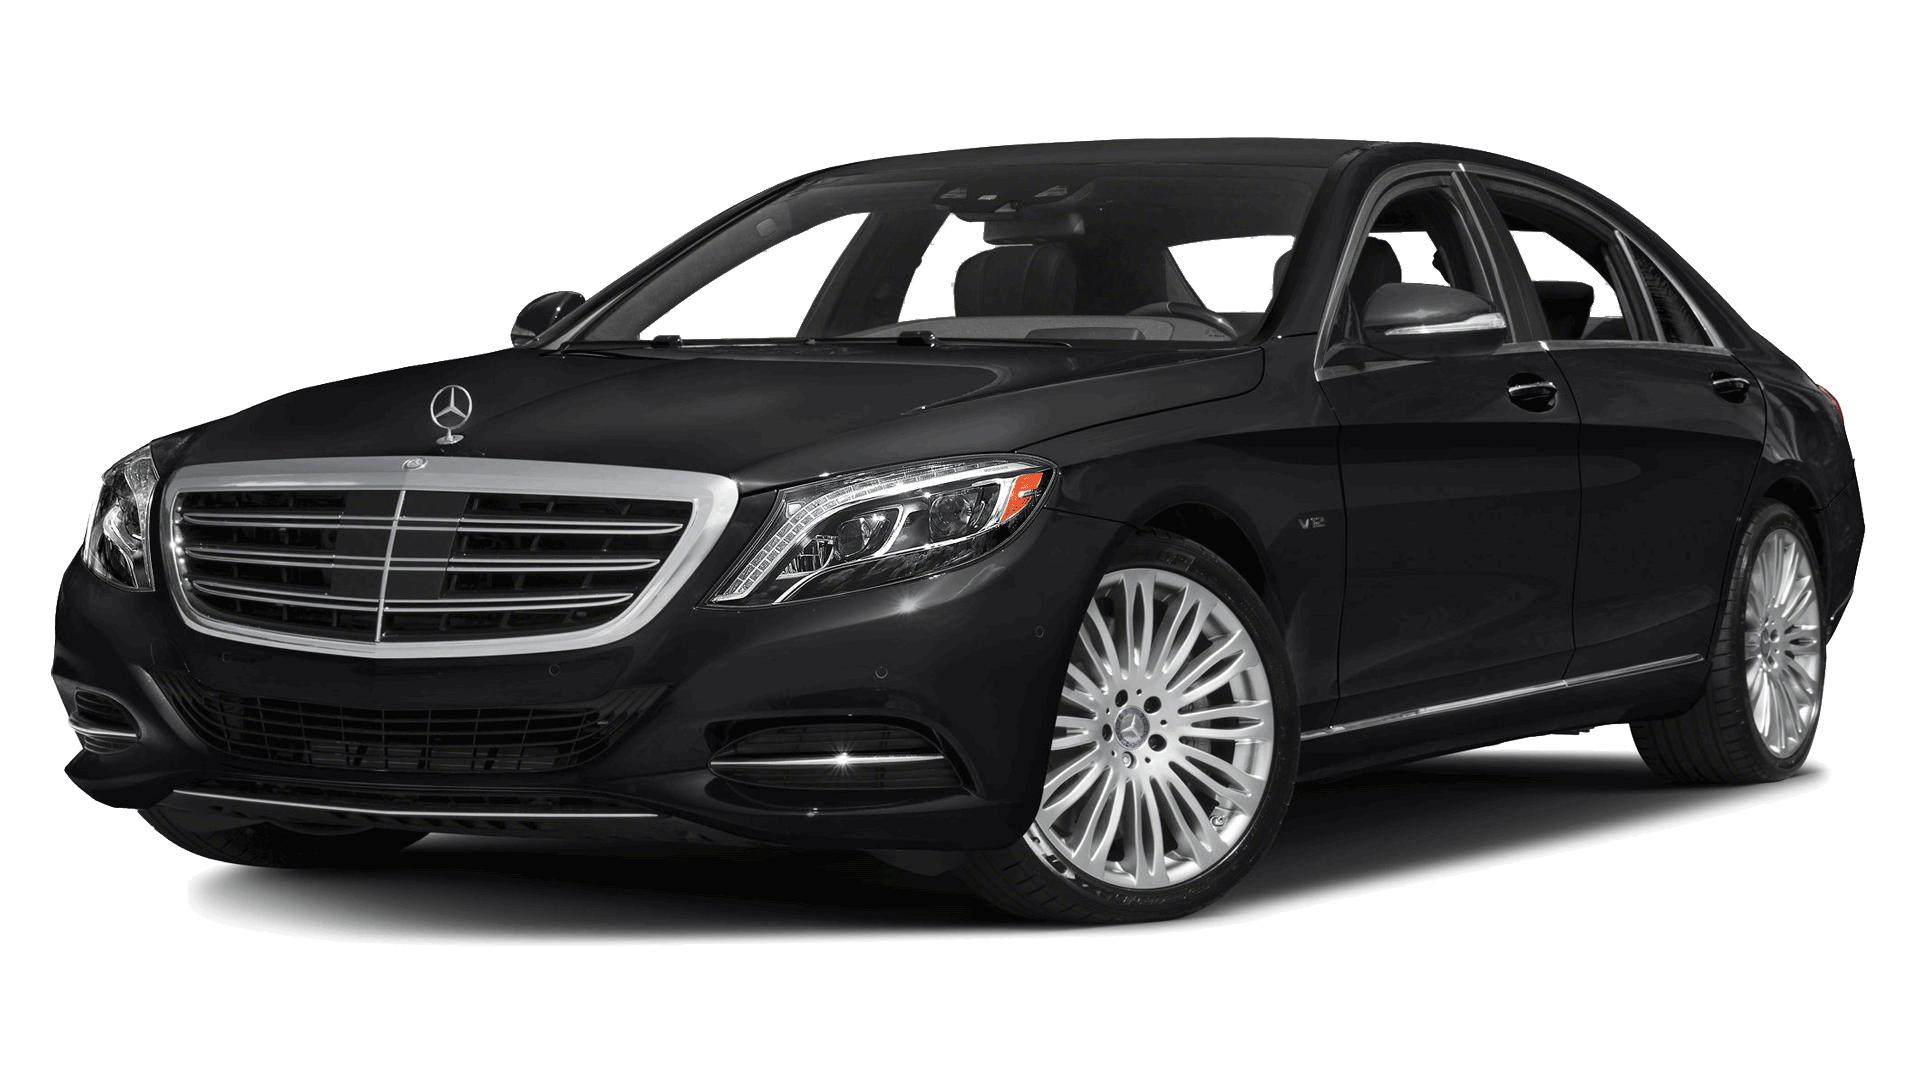 Mercedes benz s 550 rudy limousines for Mercedes benz s class 550